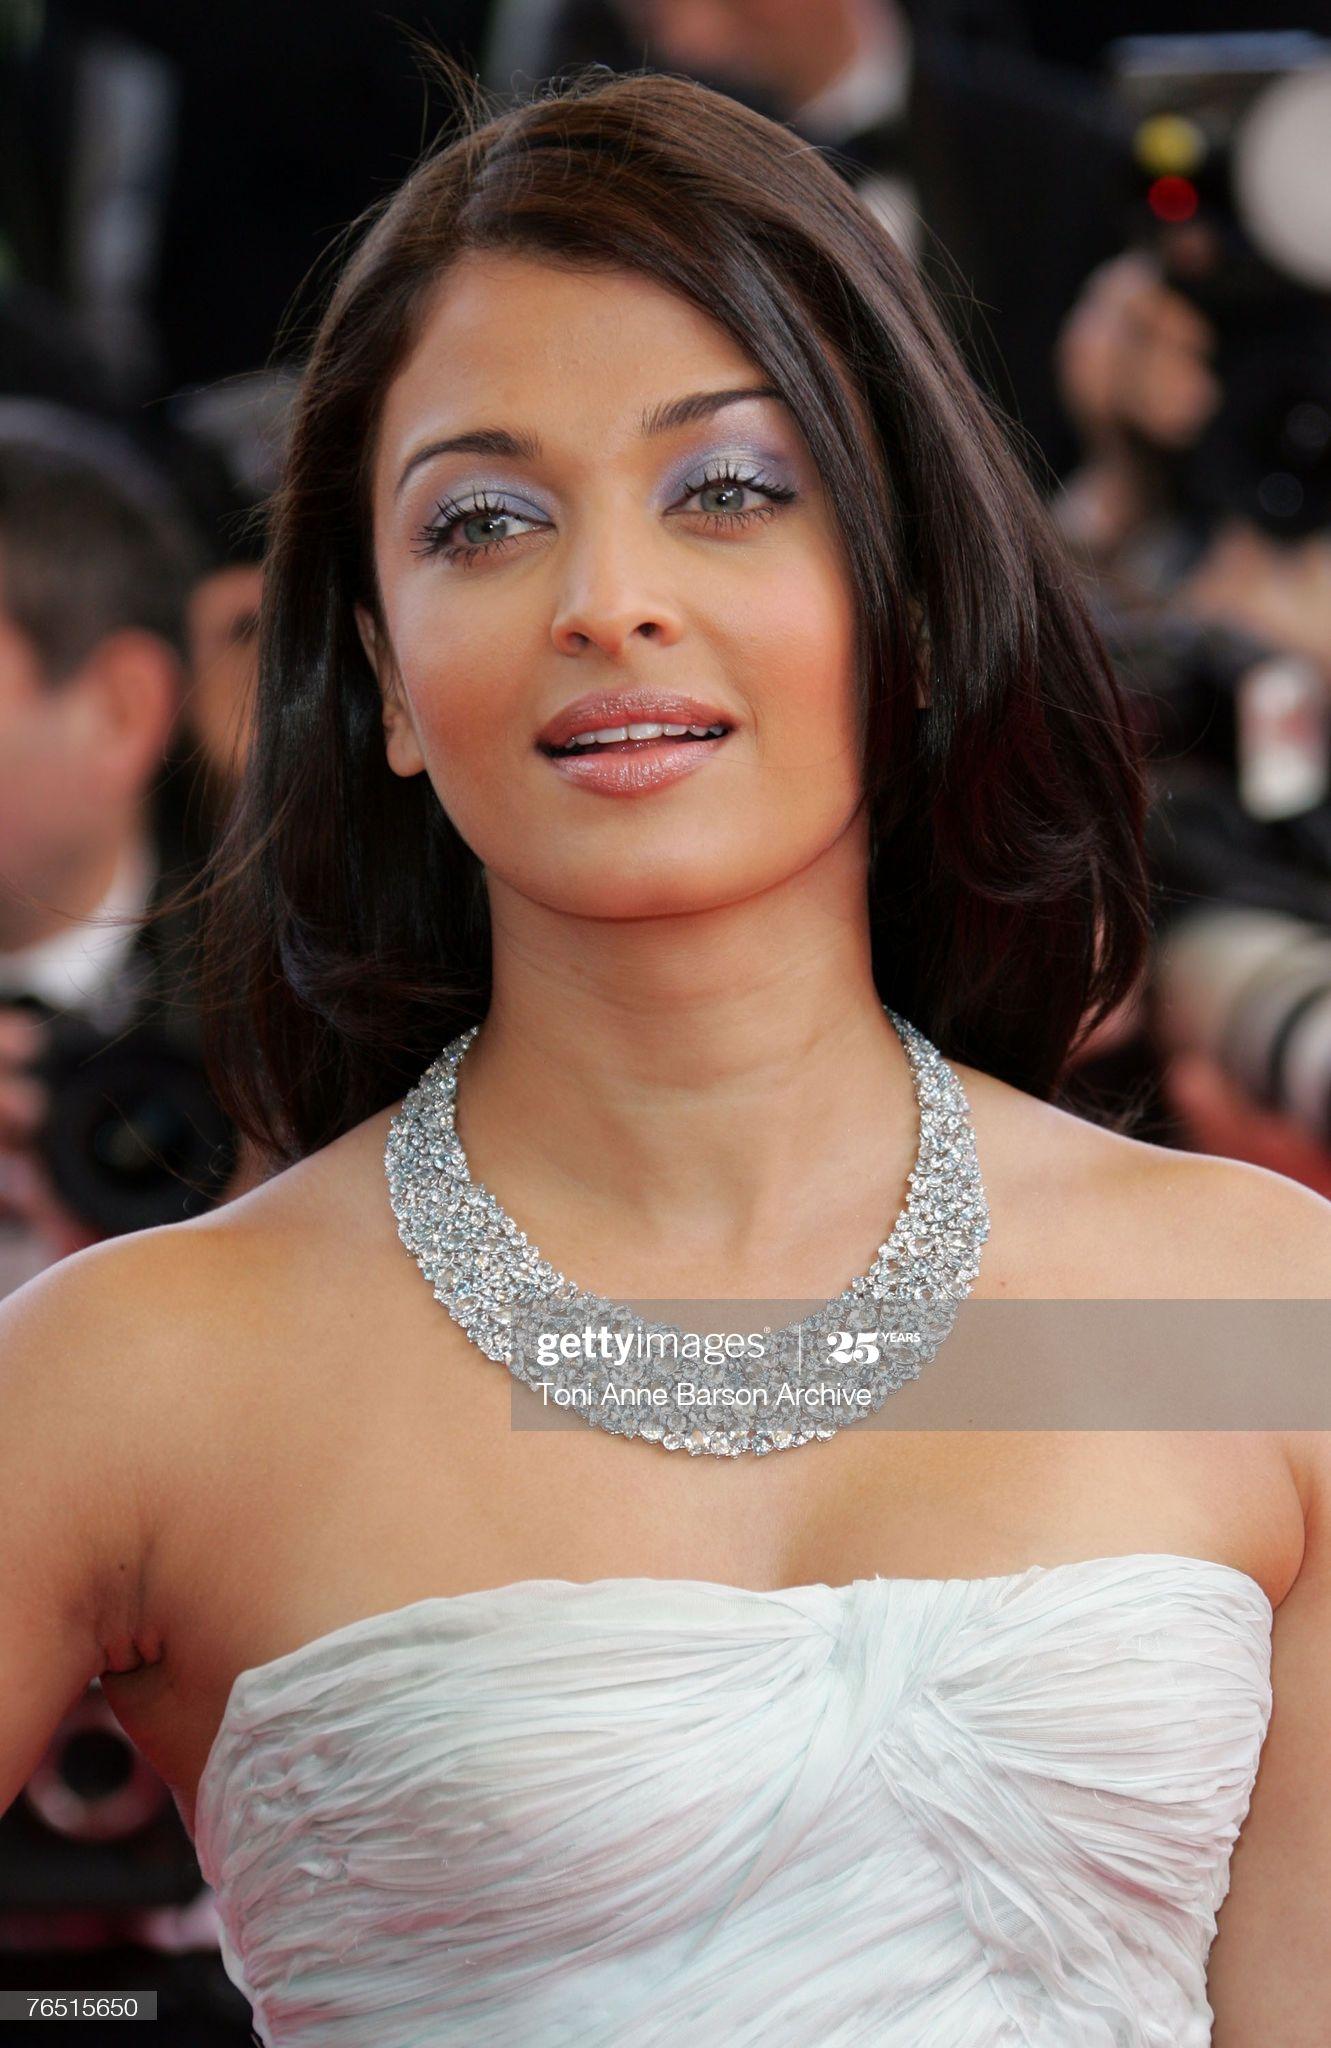 News Photo Aishwarya Rai In 2020 Actress Aishwarya Rai Aishwarya Rai Aishwarya Rai Bachchan